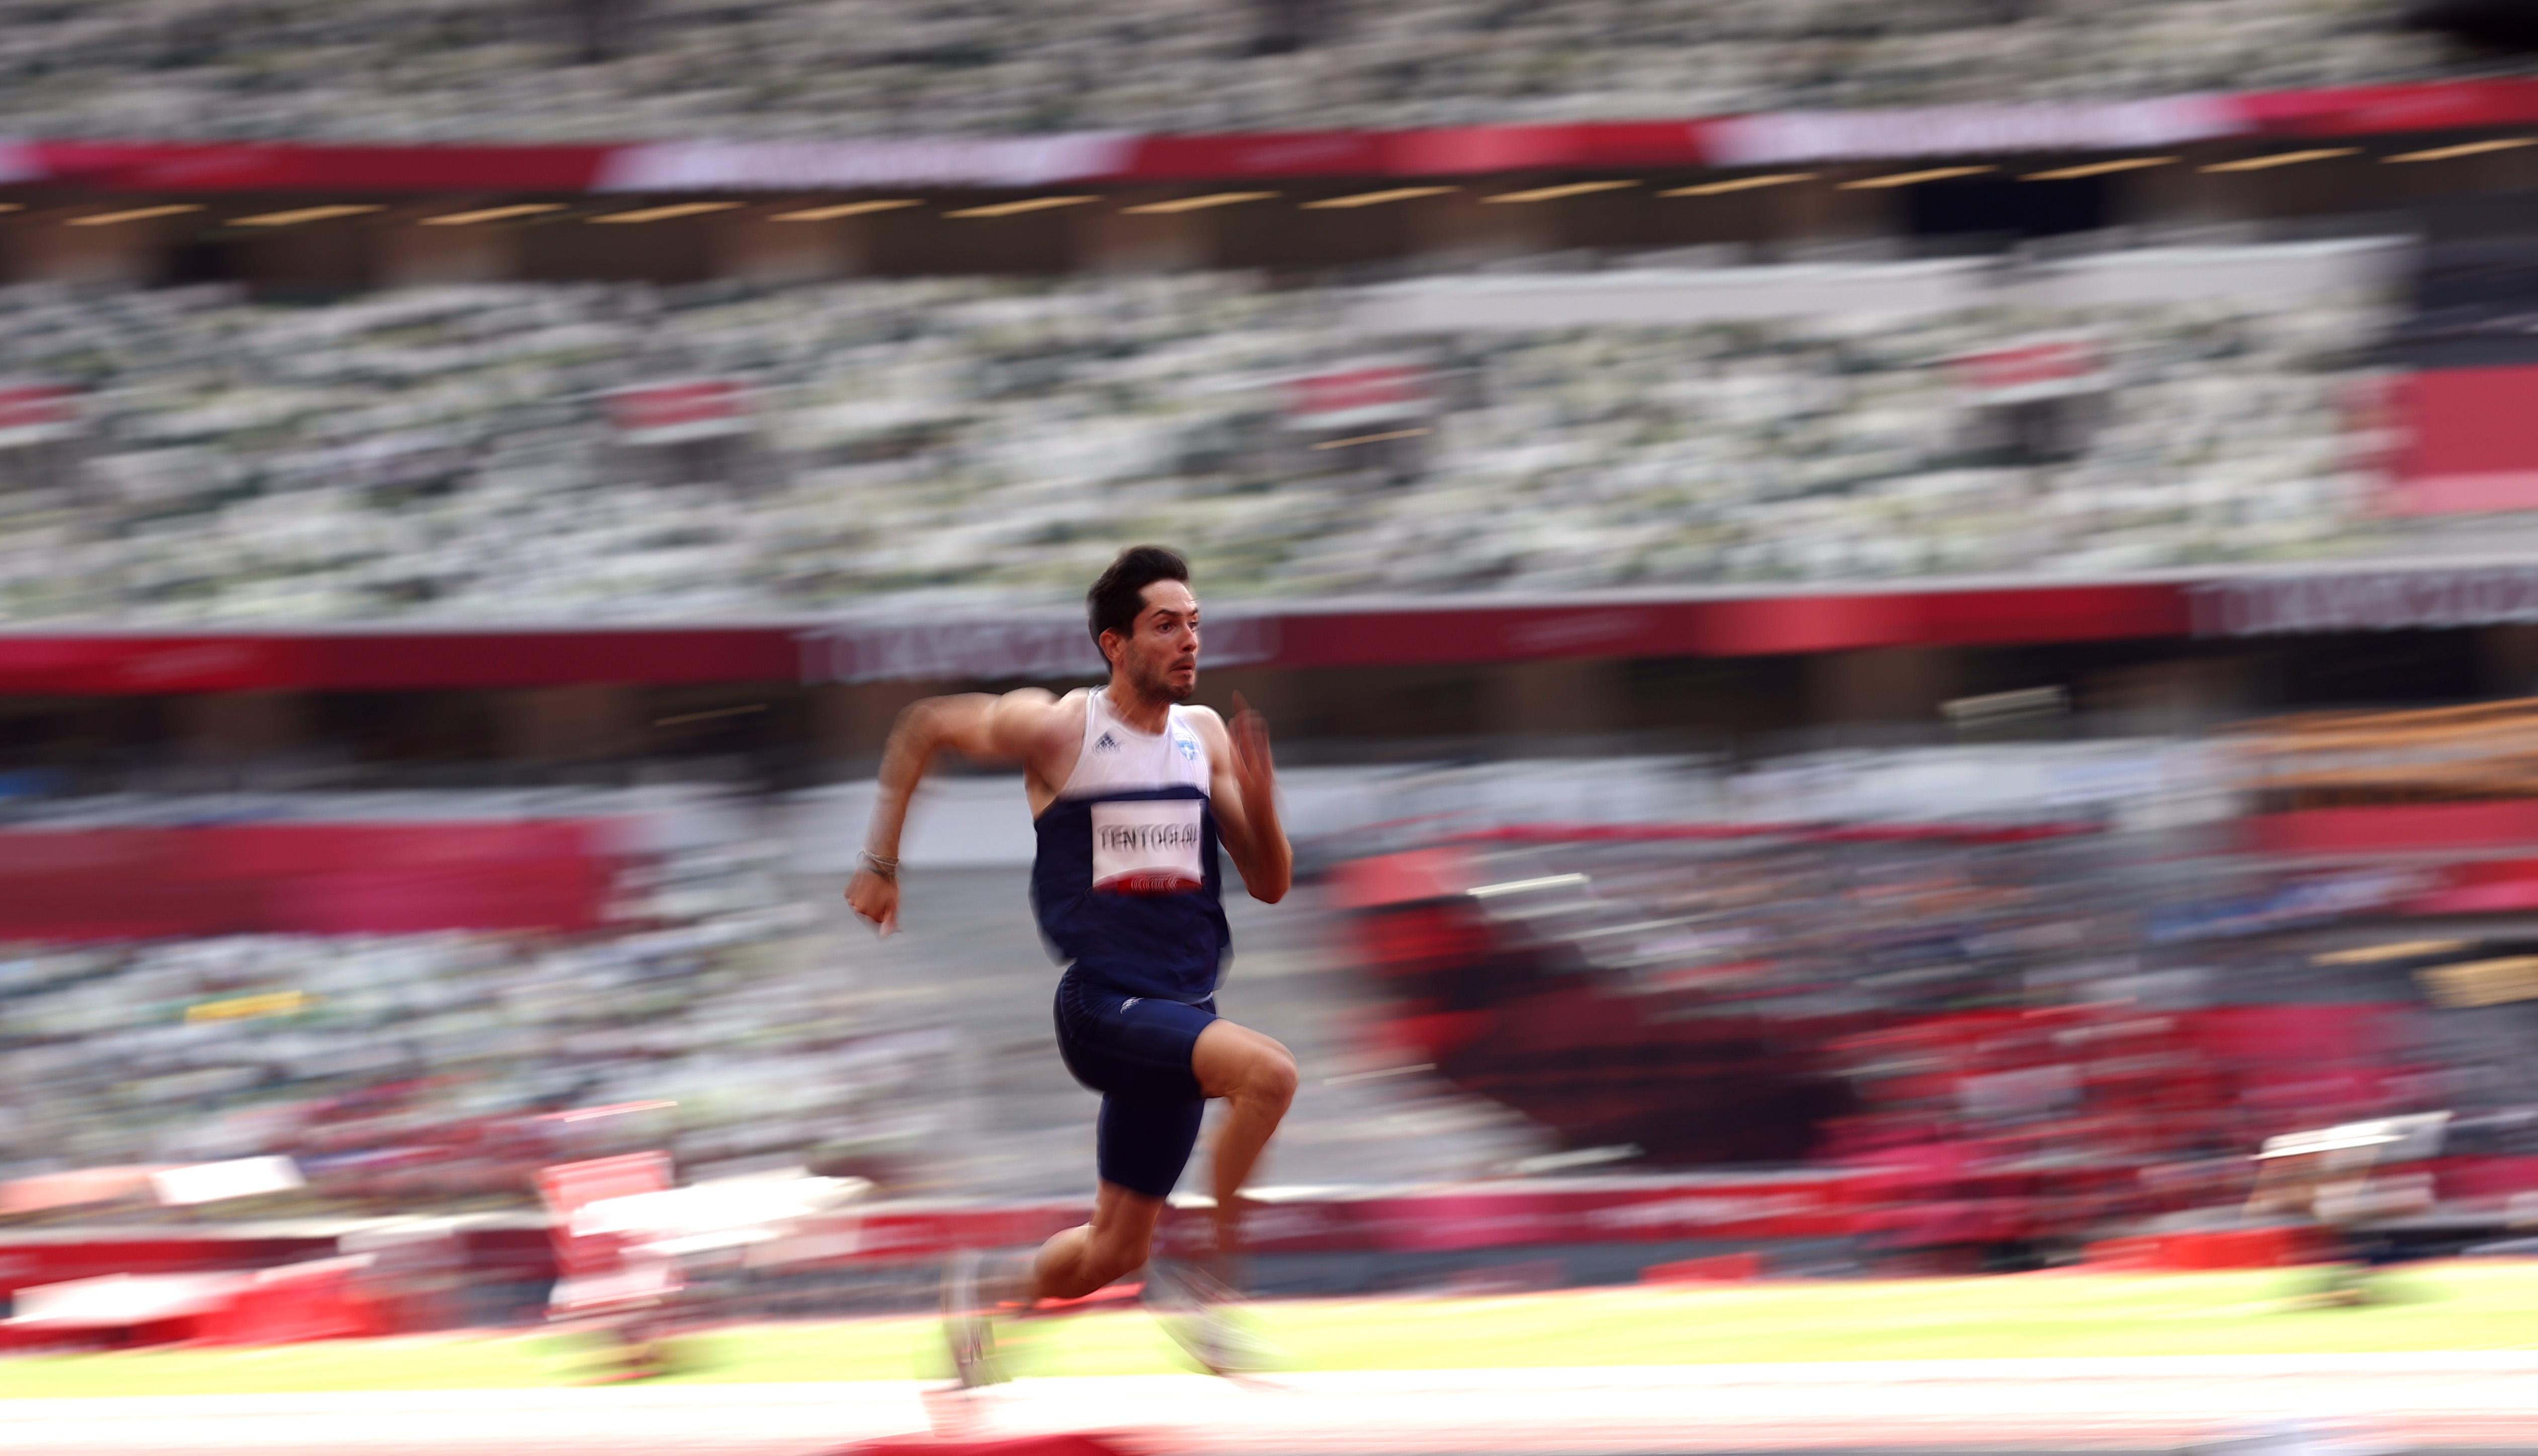 Tokyo 2020 Olympics - Athletics - Men's Long Jump - Final - Olympic Stadium, Tokyo, Japan - August 2, 2021. Miltiadis Tentoglou of Greece in action. REUTERS/Andrew Boyers